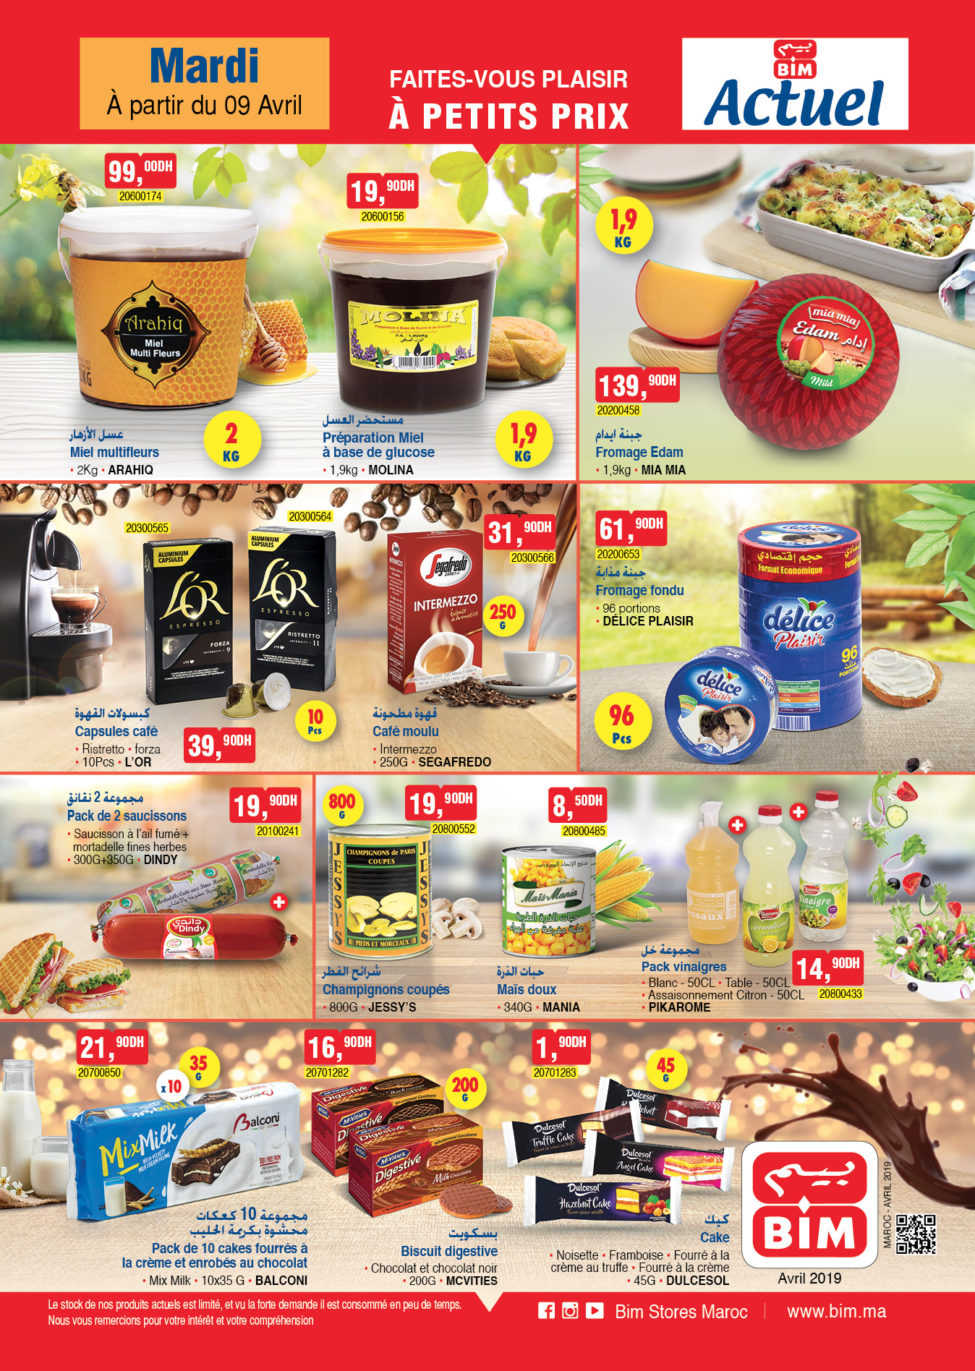 Catalogue Bim Maroc Spéciale Alimentation du Mardi 9 Avril 2019